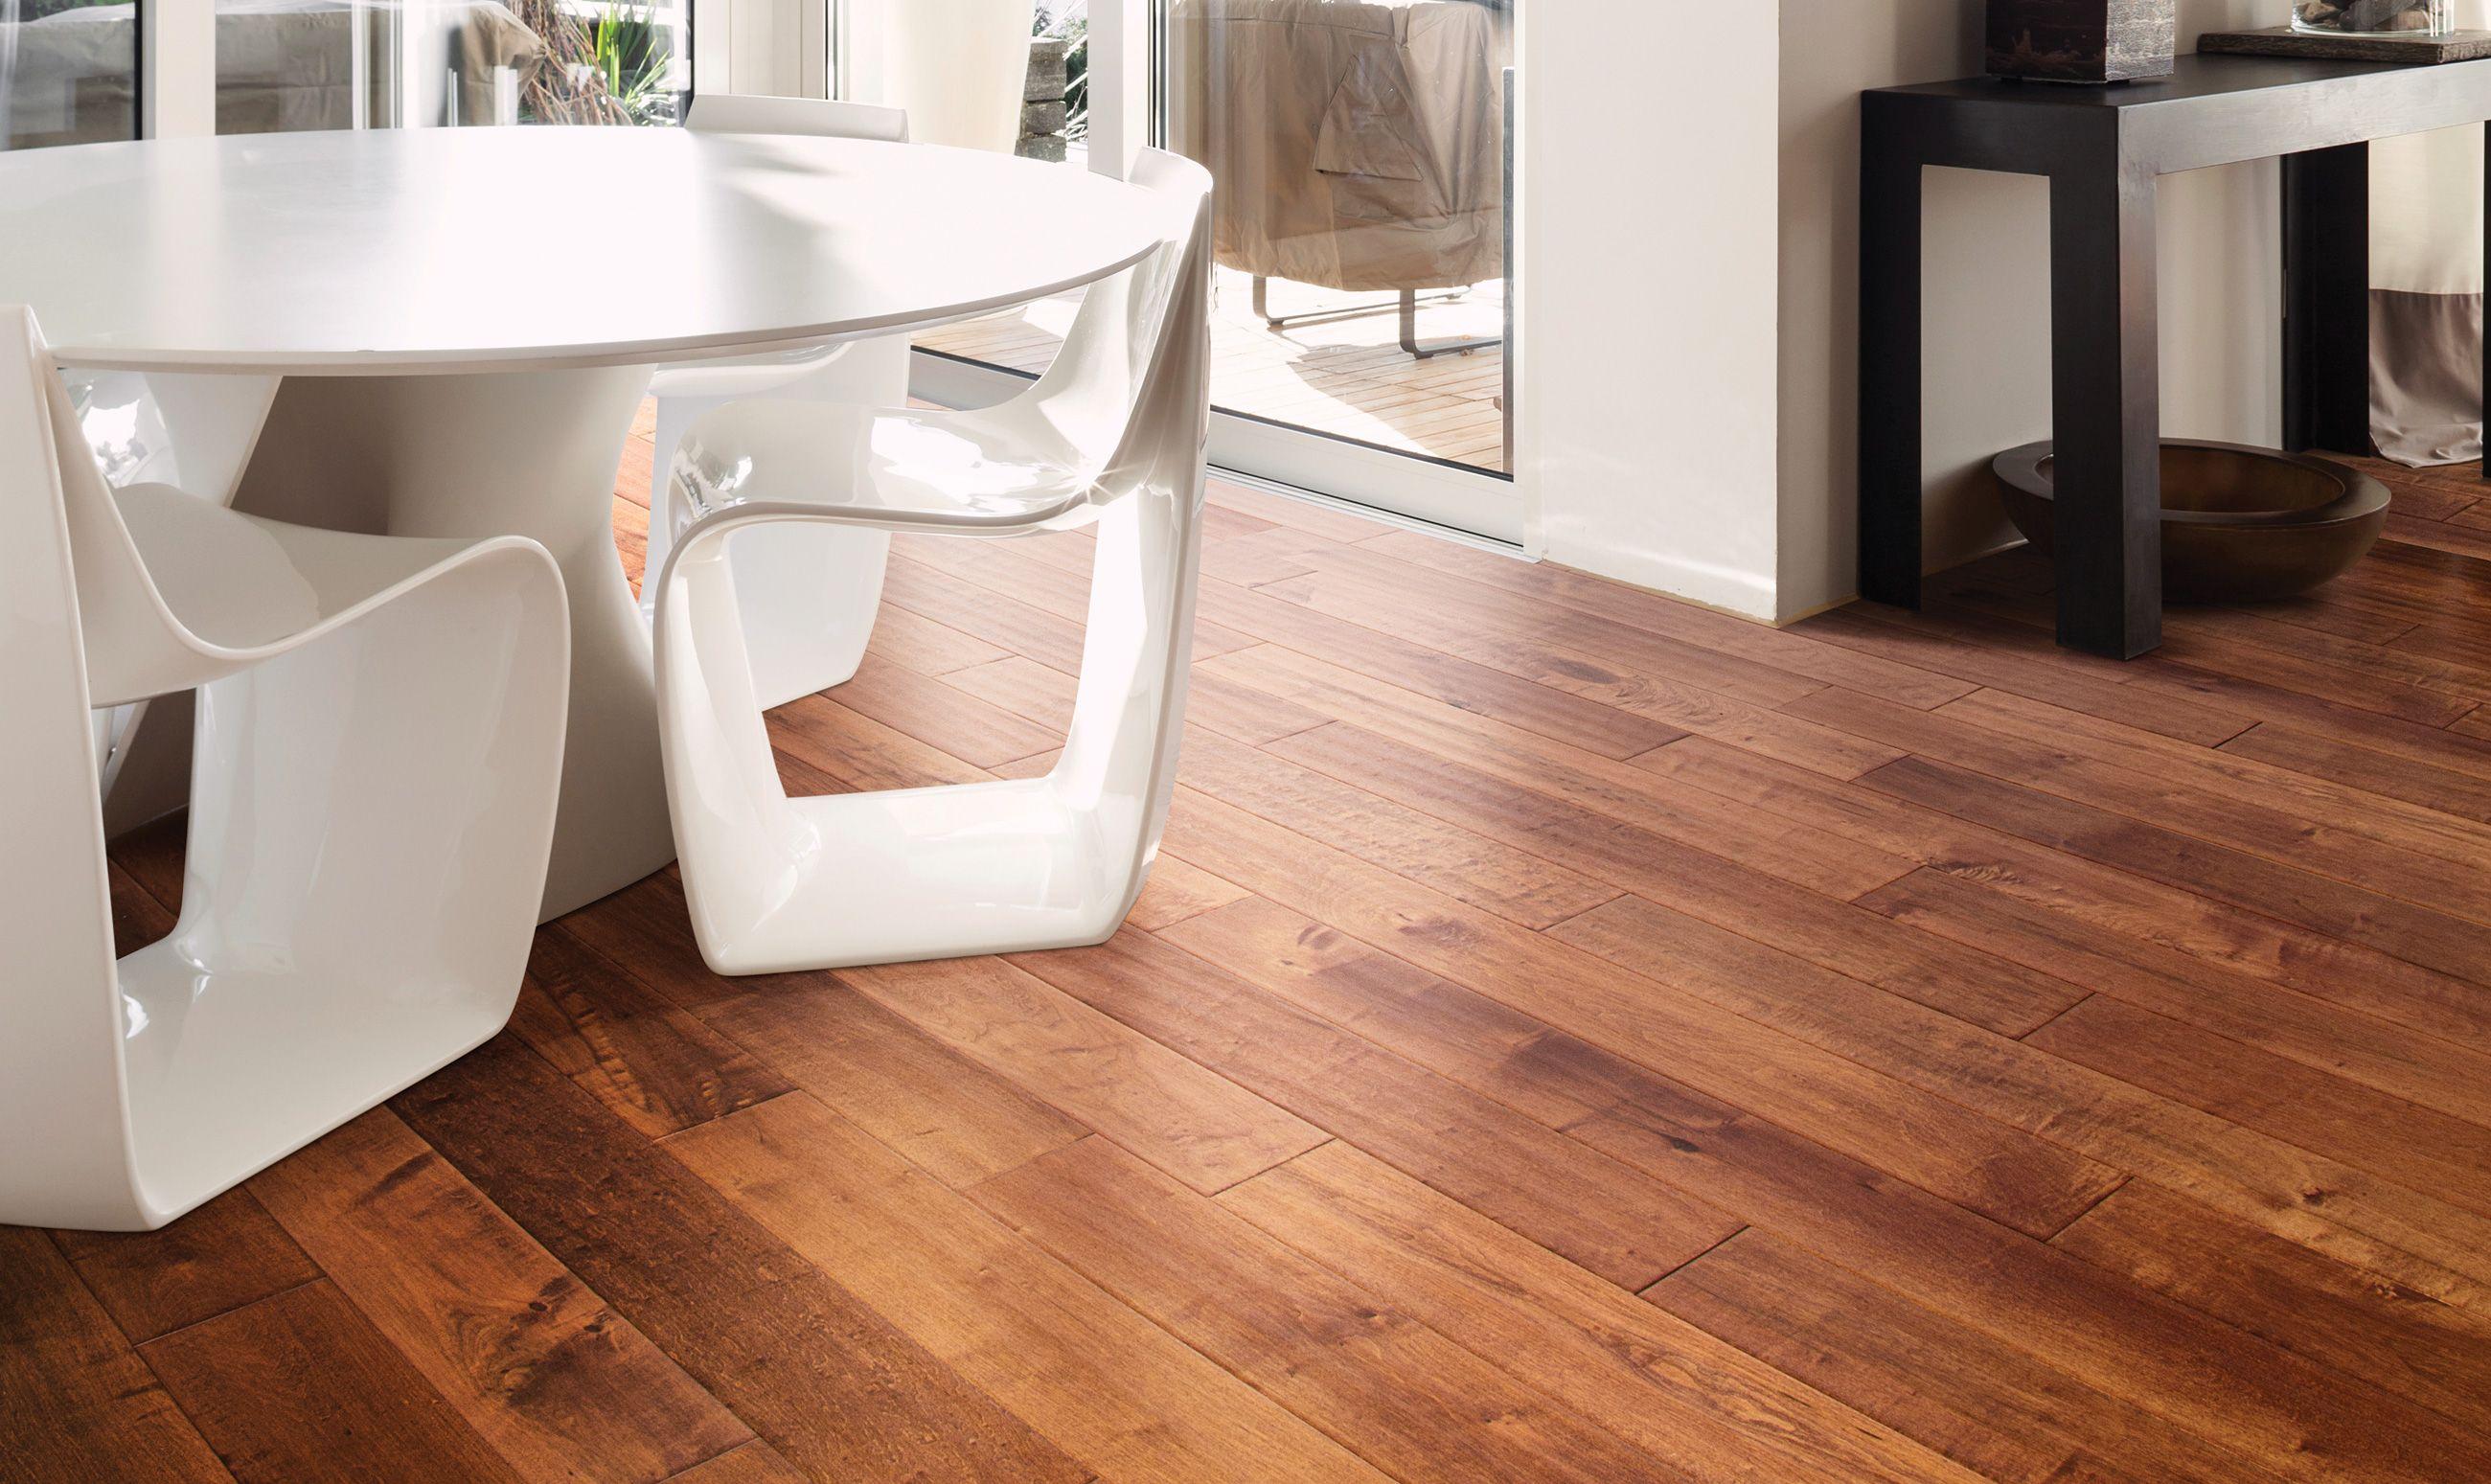 floor pergo maple sandbankmaple solid sandbank flooring hardwood era lrg american